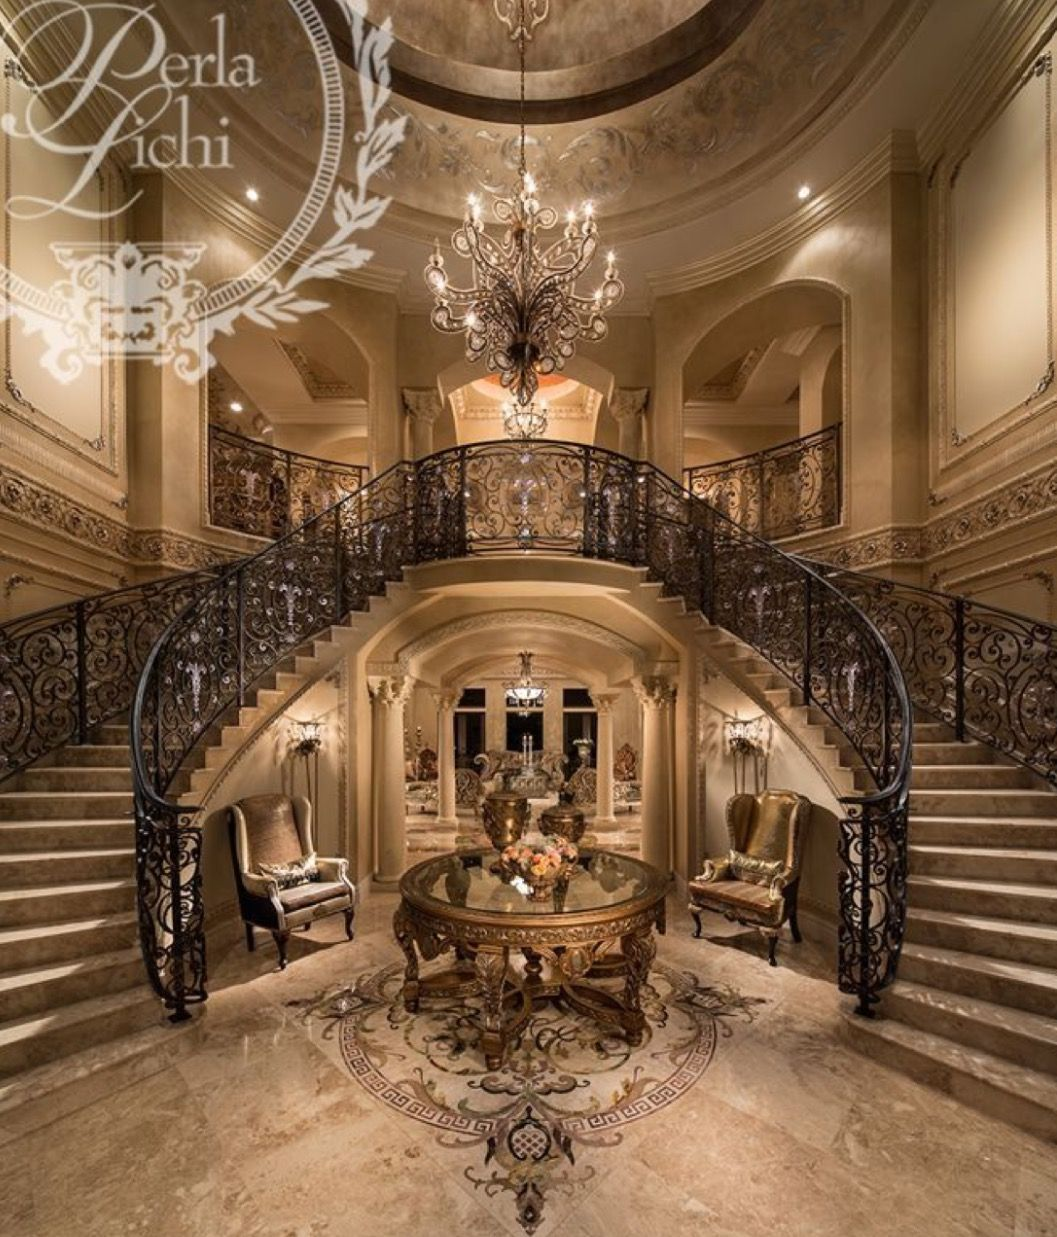 Discover ideas about Belle Demeure A spacious